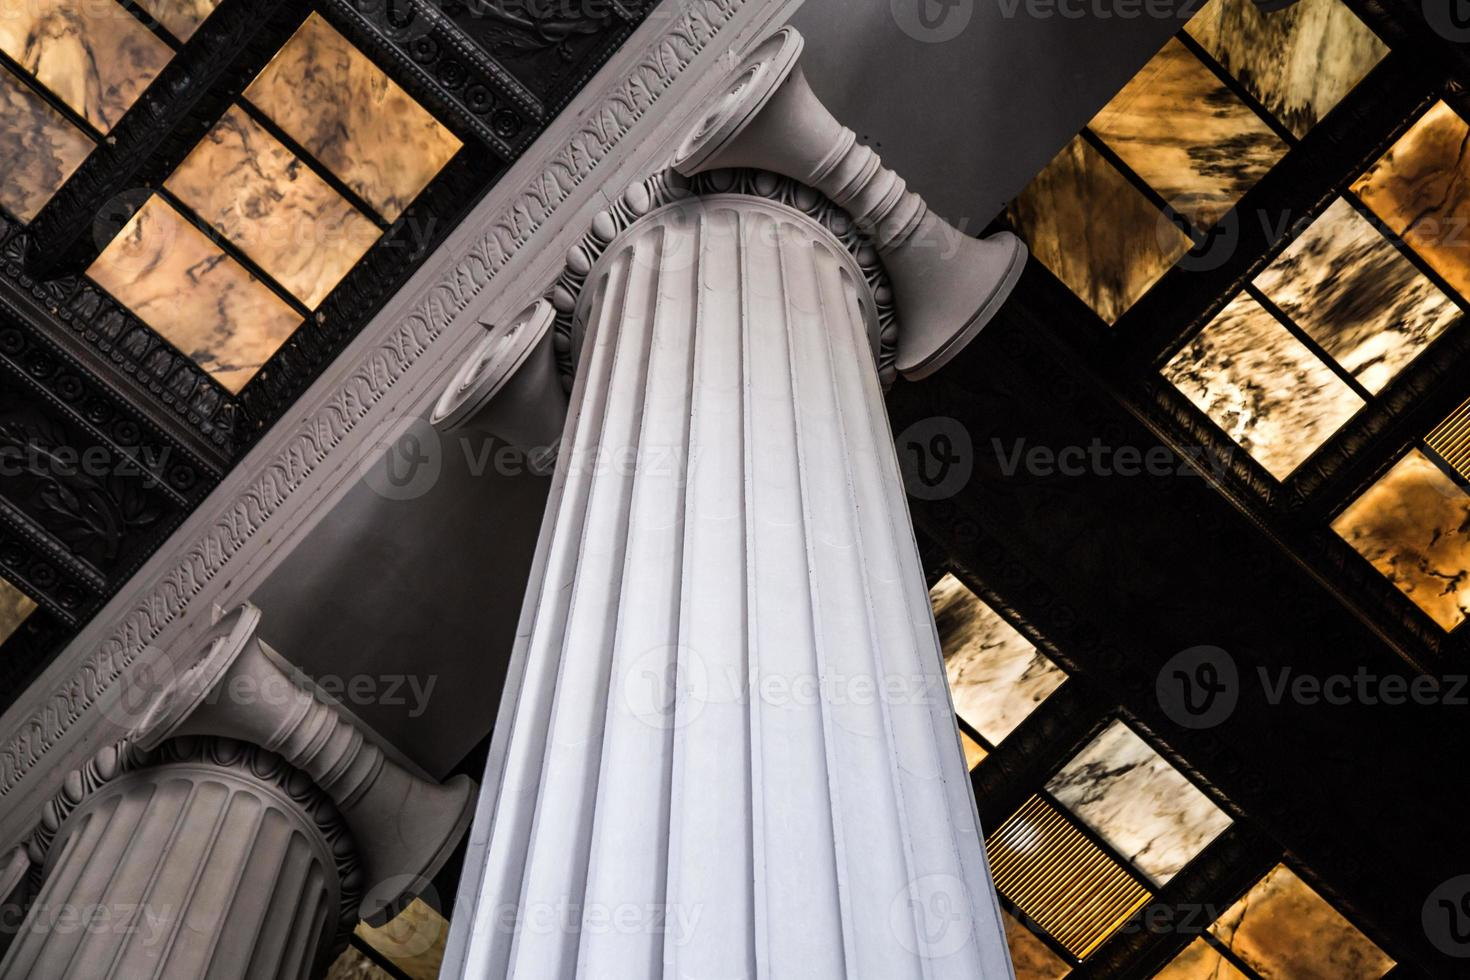 dc columnas conmemorativas foto